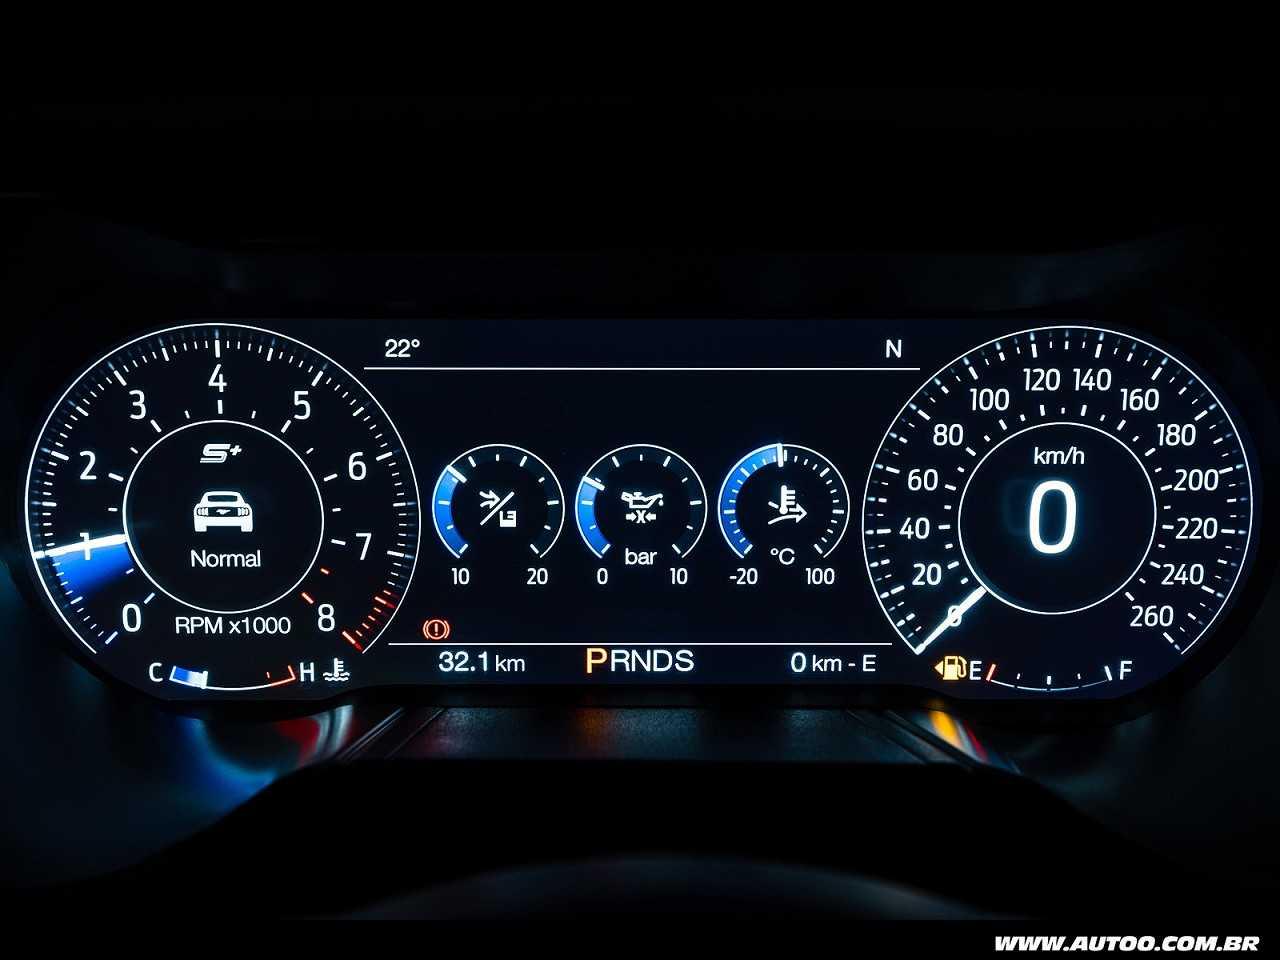 FordMustang 2018 - painel de instrumentos